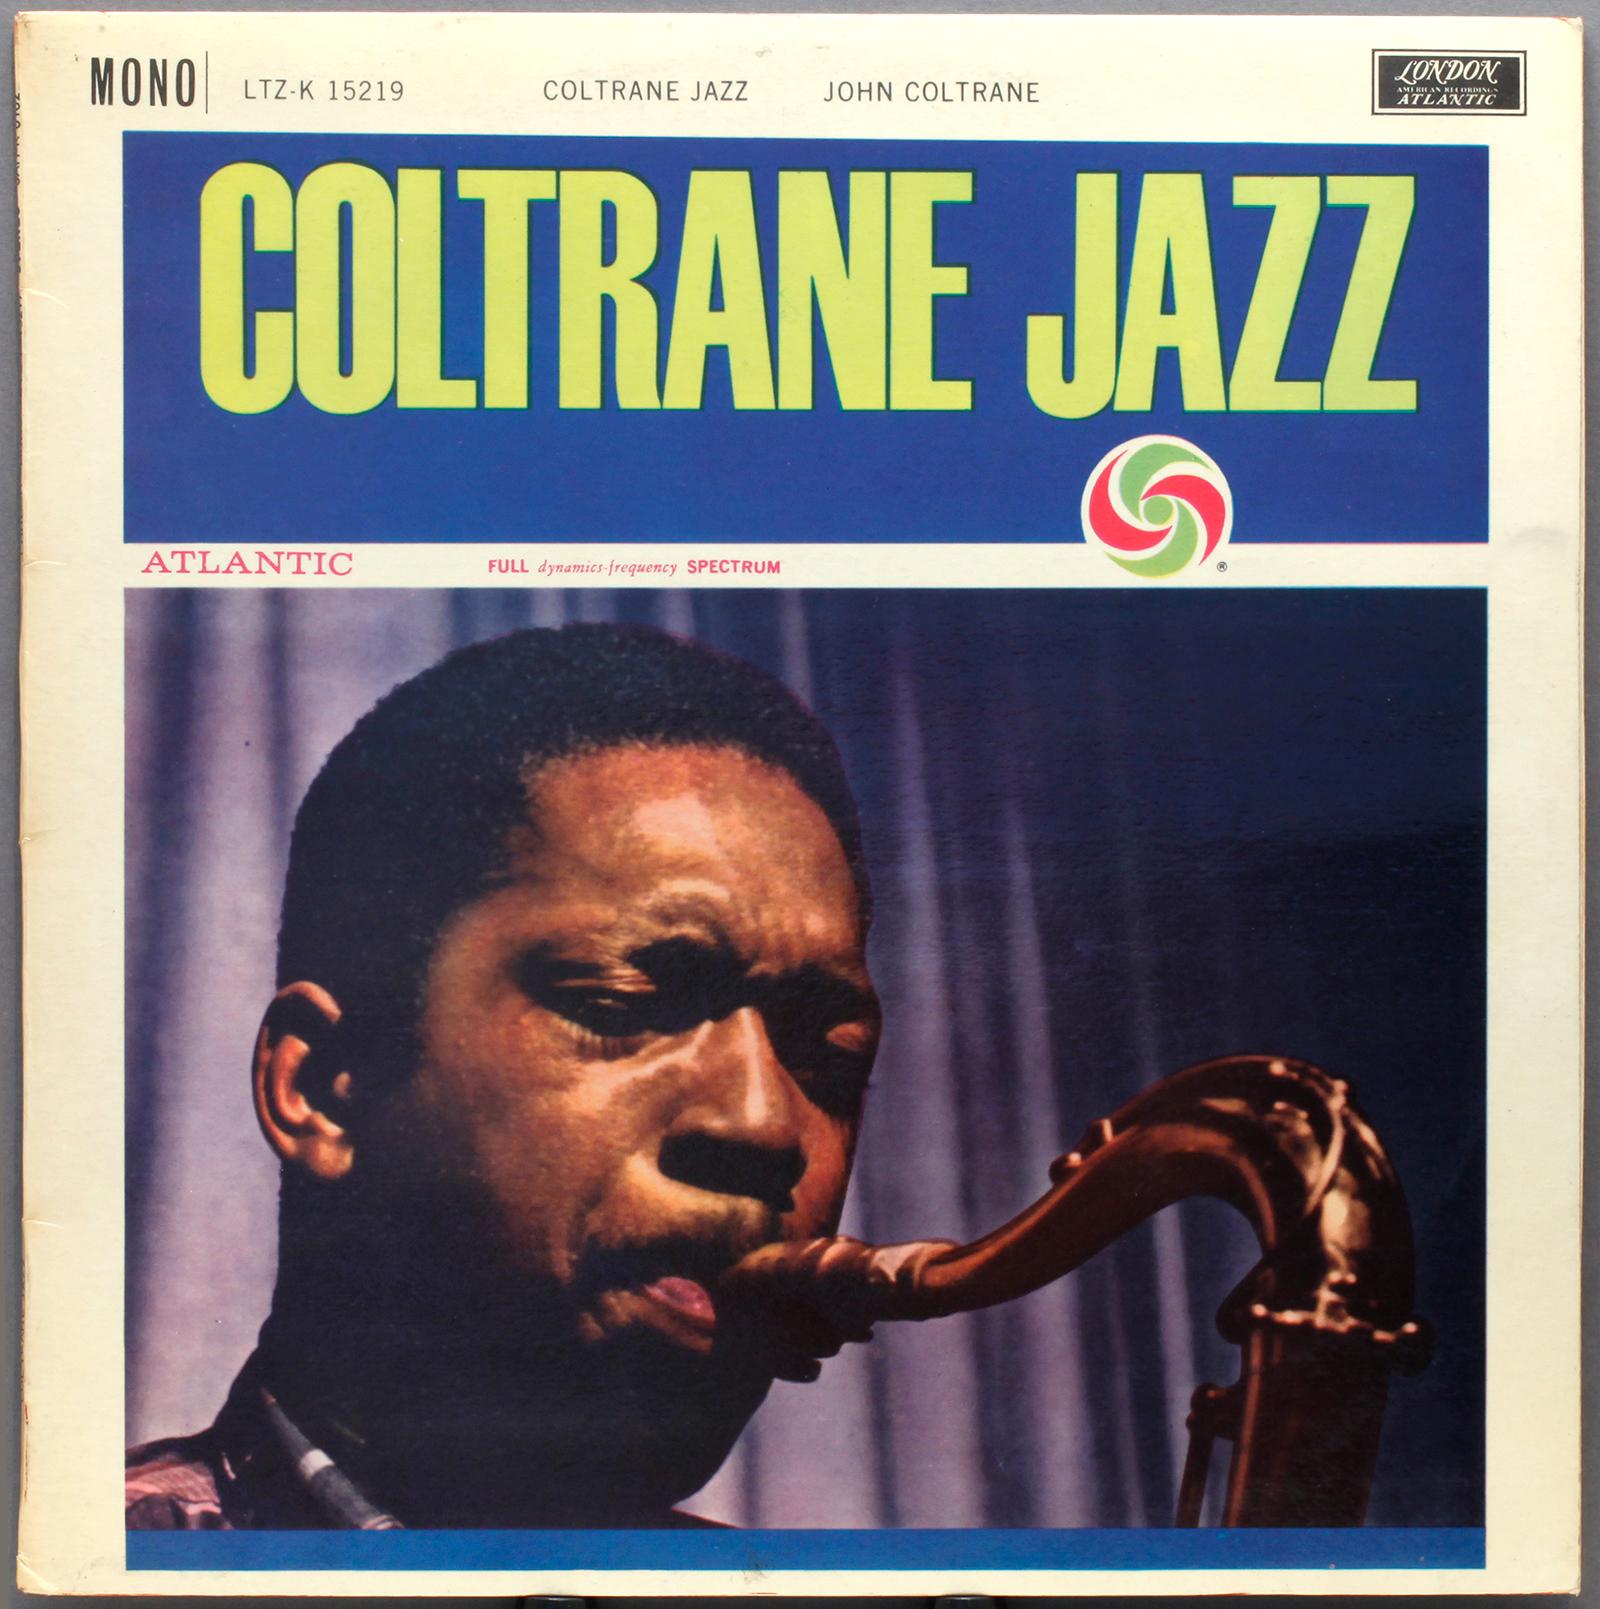 Coltrane Jazz 1960 London Atlantic Londonjazzcollector